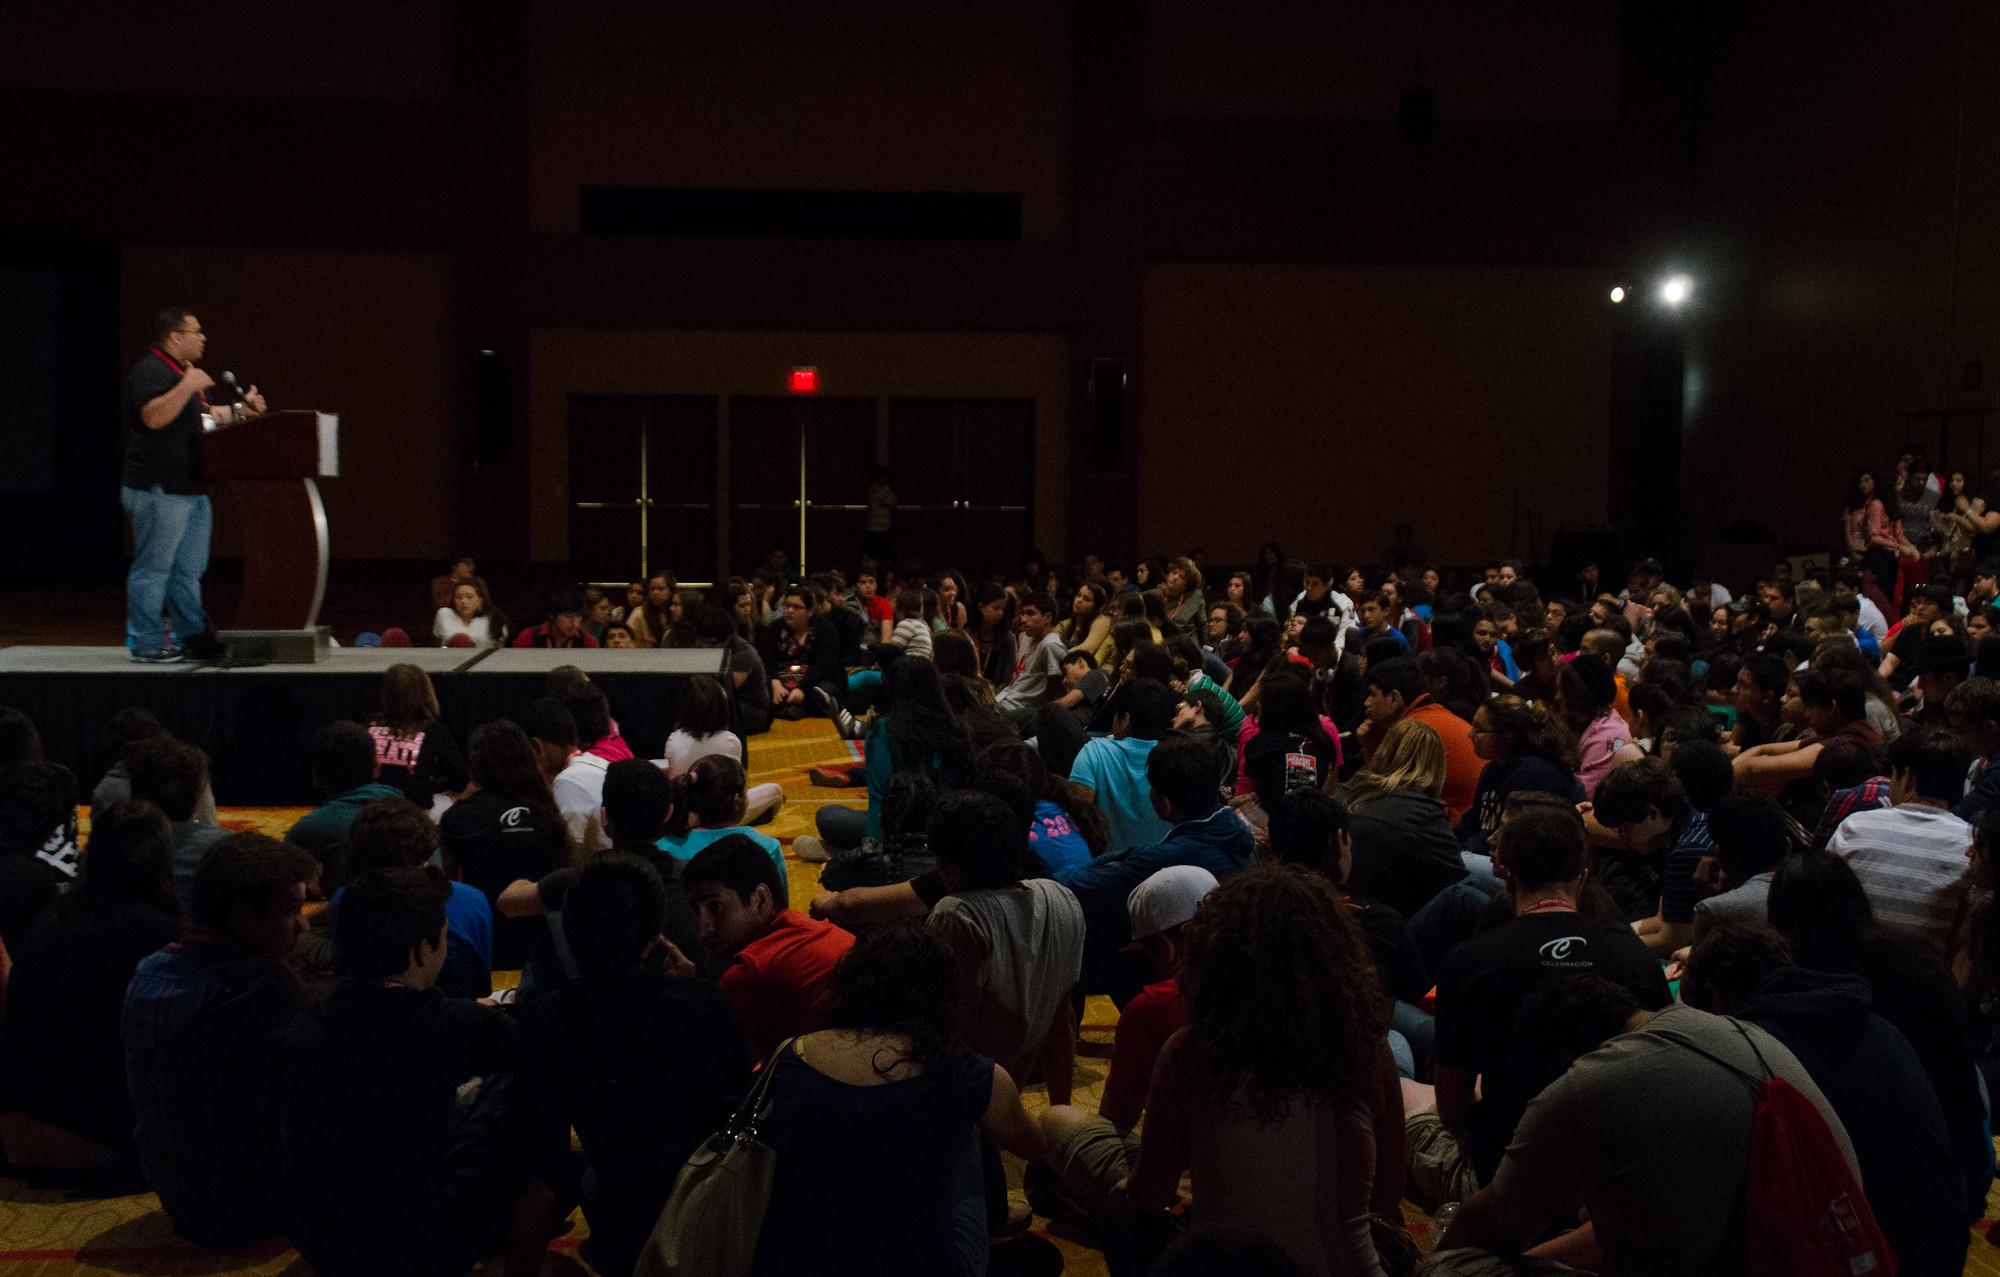 Julio Cotto addresses a crowd of students at the 2012 National Hispanic Institute's Celebracion event in San Antonio.